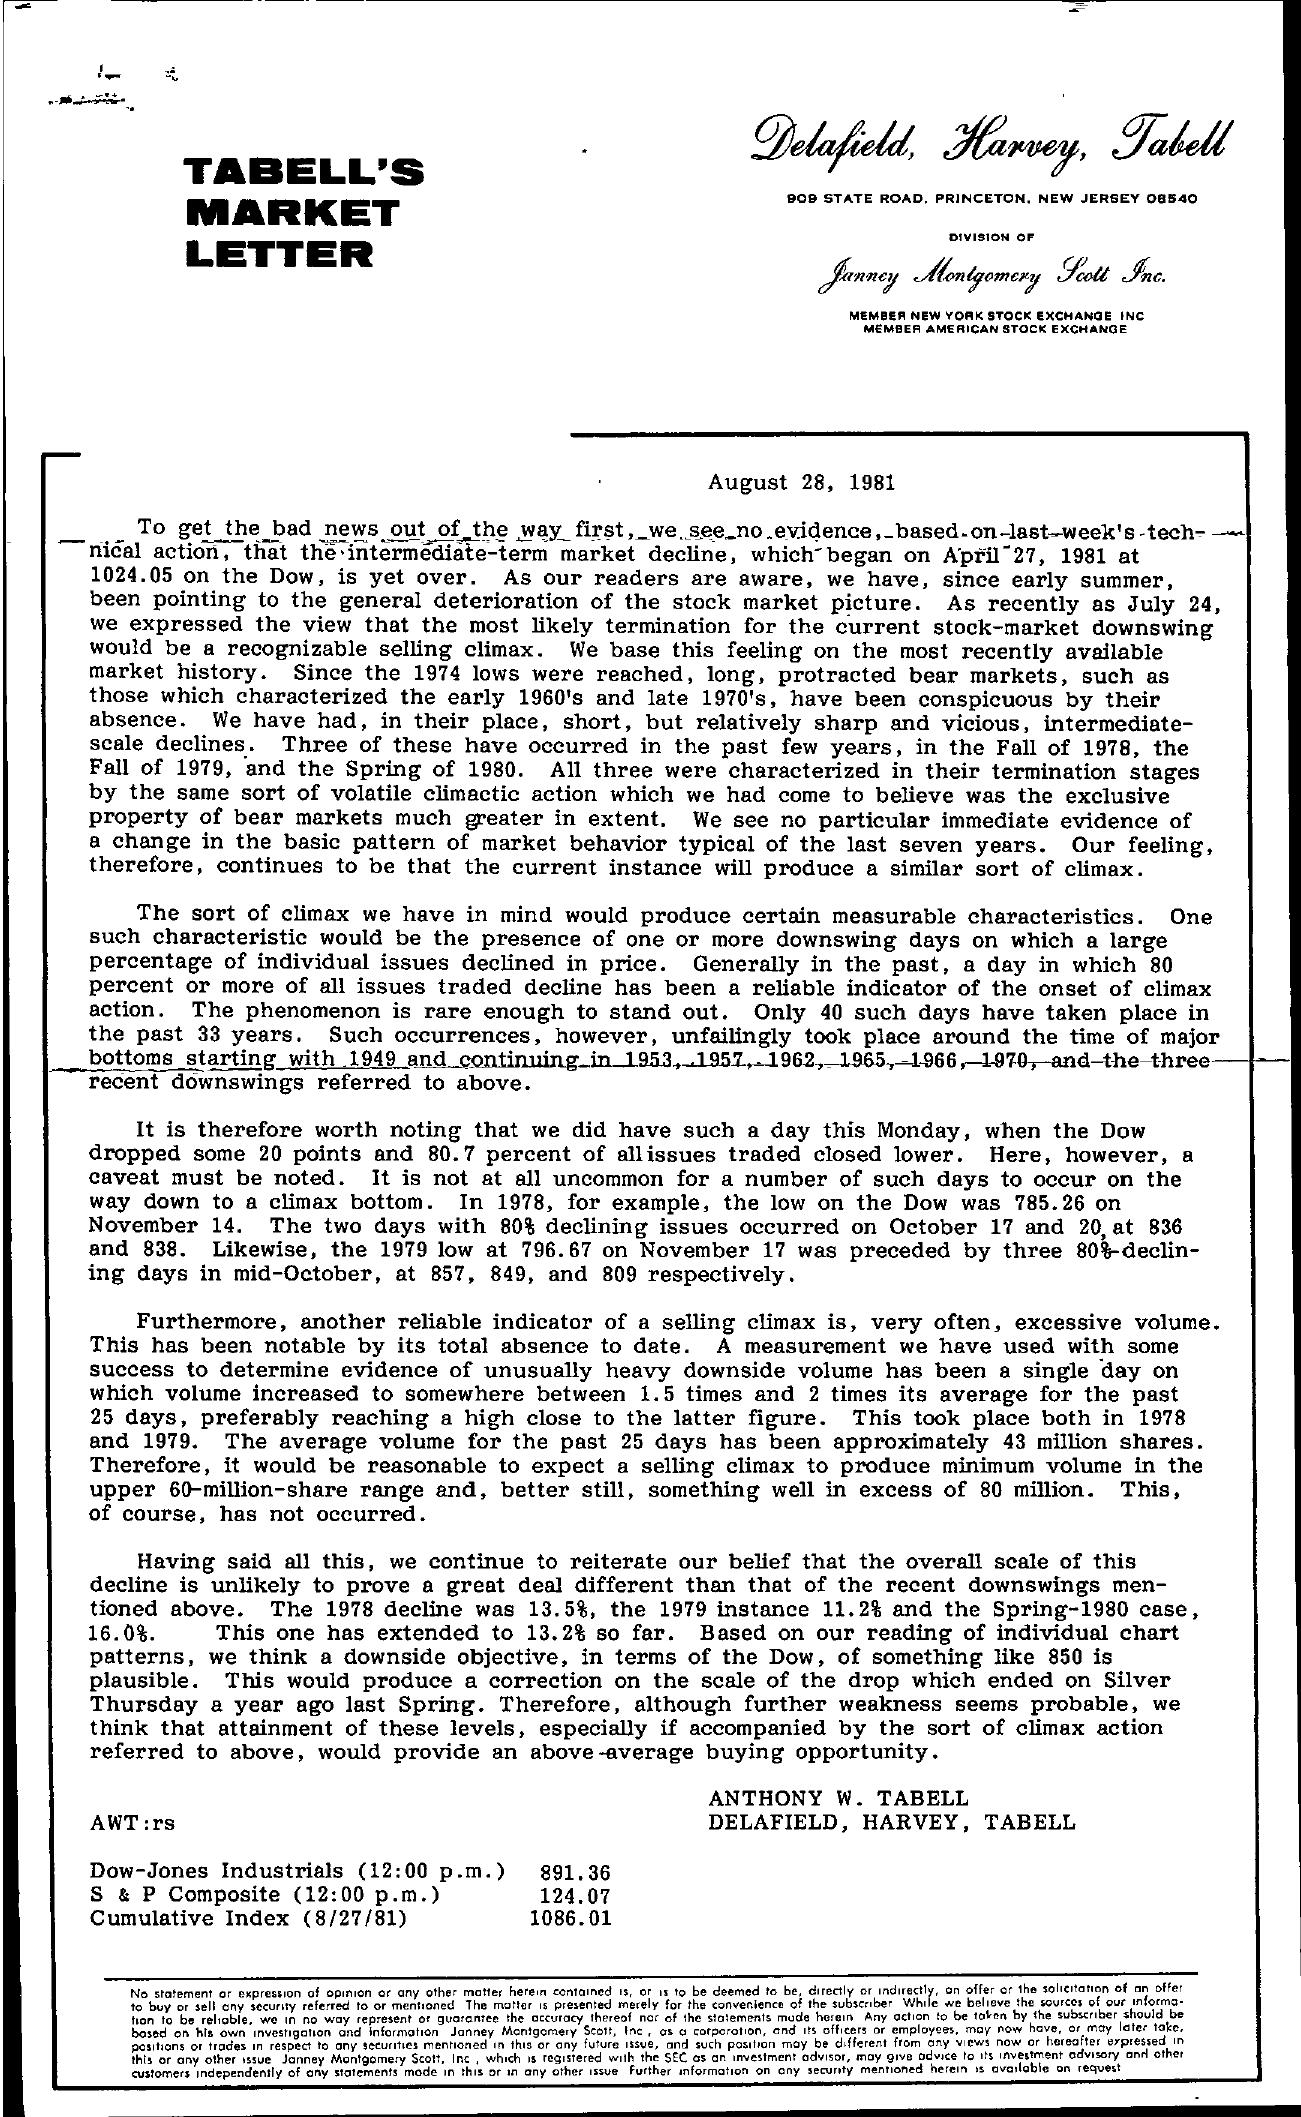 Tabell's Market Letter - August 28, 1981